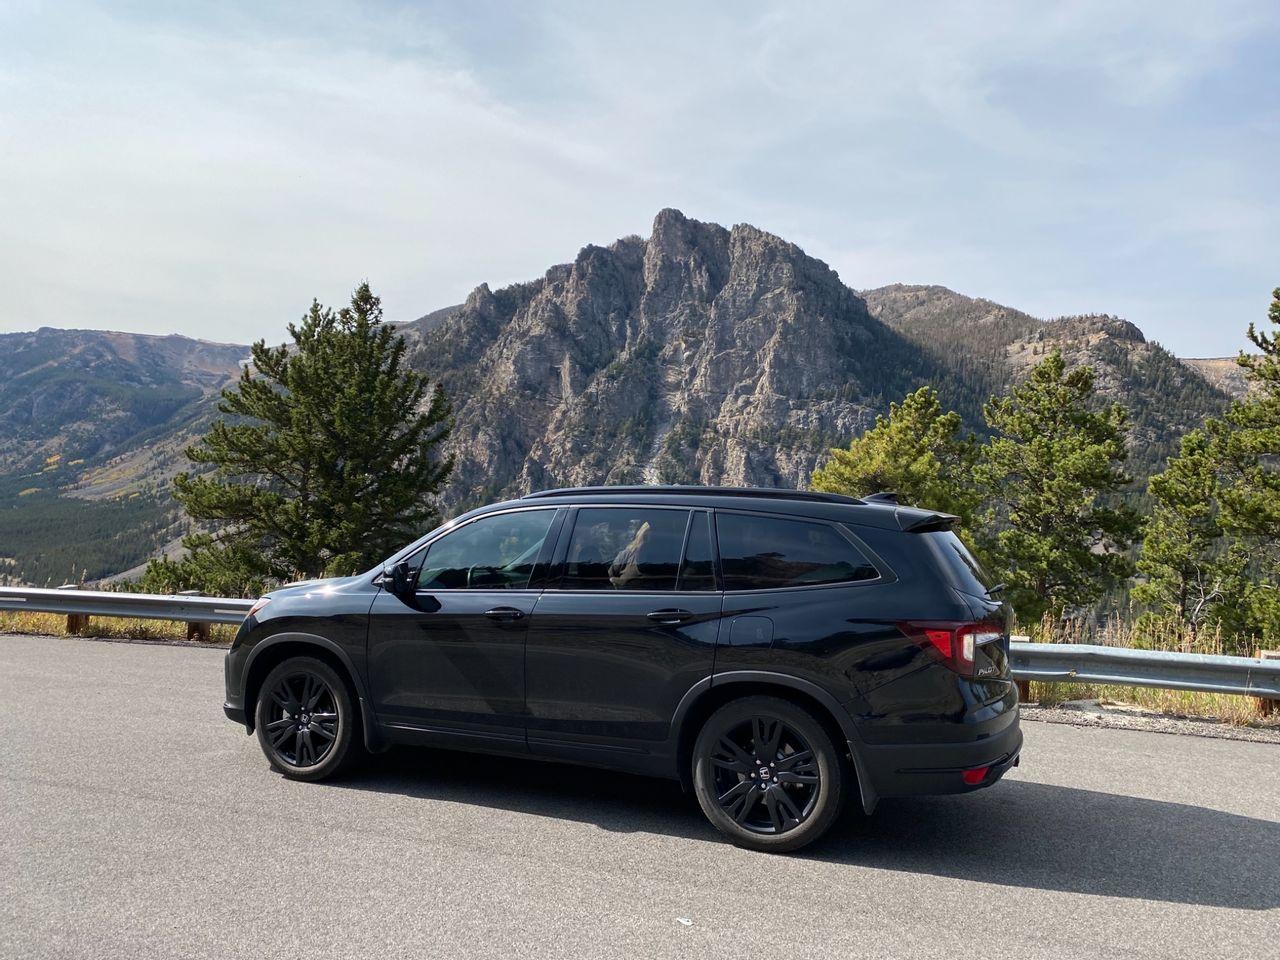 2020 Honda Pilot Black Edition | Sioux Falls, SD, Crystal Black Pearl (Black), All Wheel